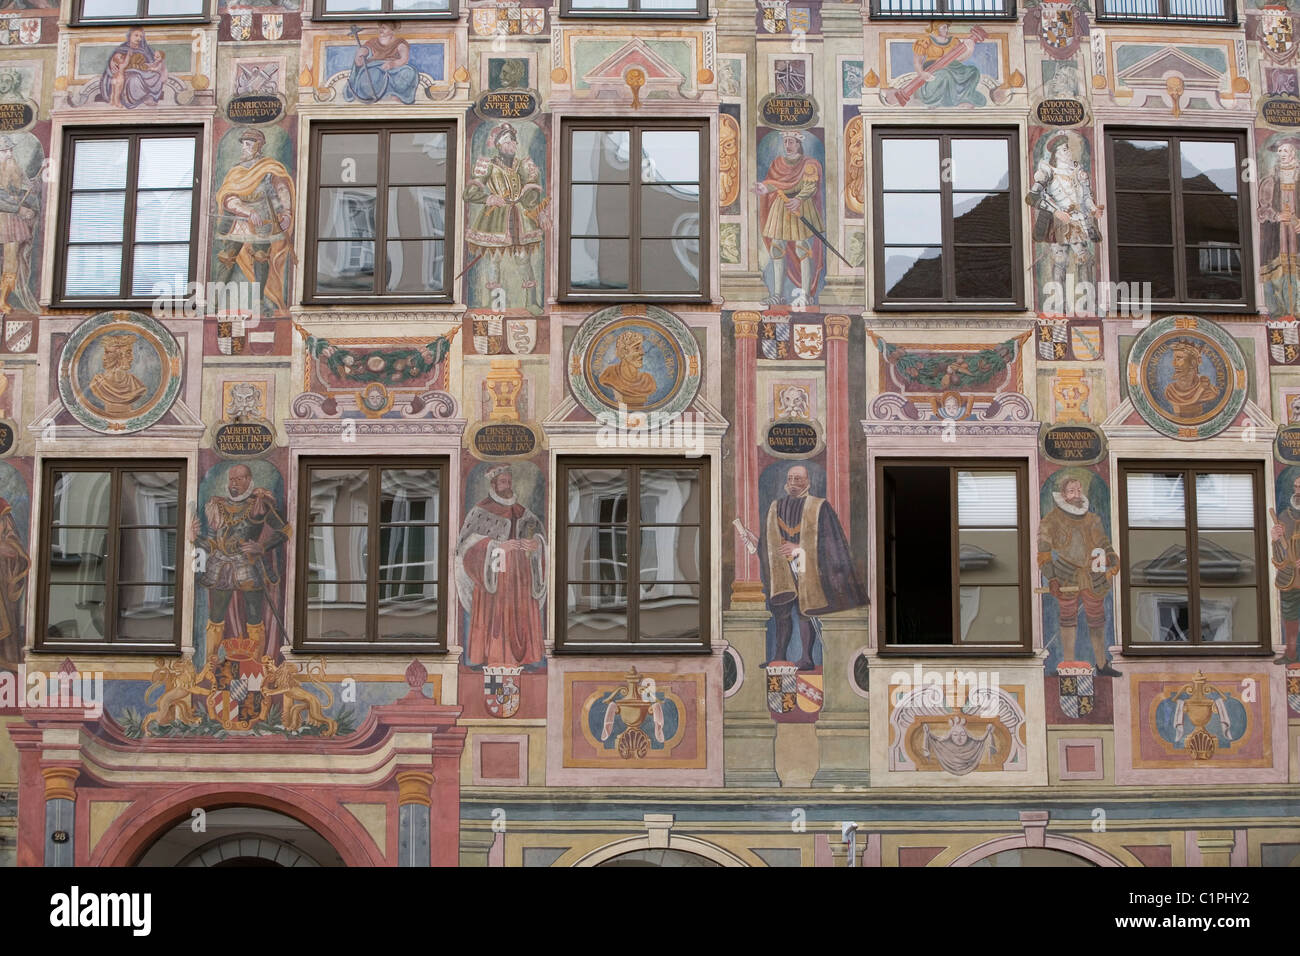 Deutschland, Bayern, Landshut, Sgraffito-Fassade Stockbild